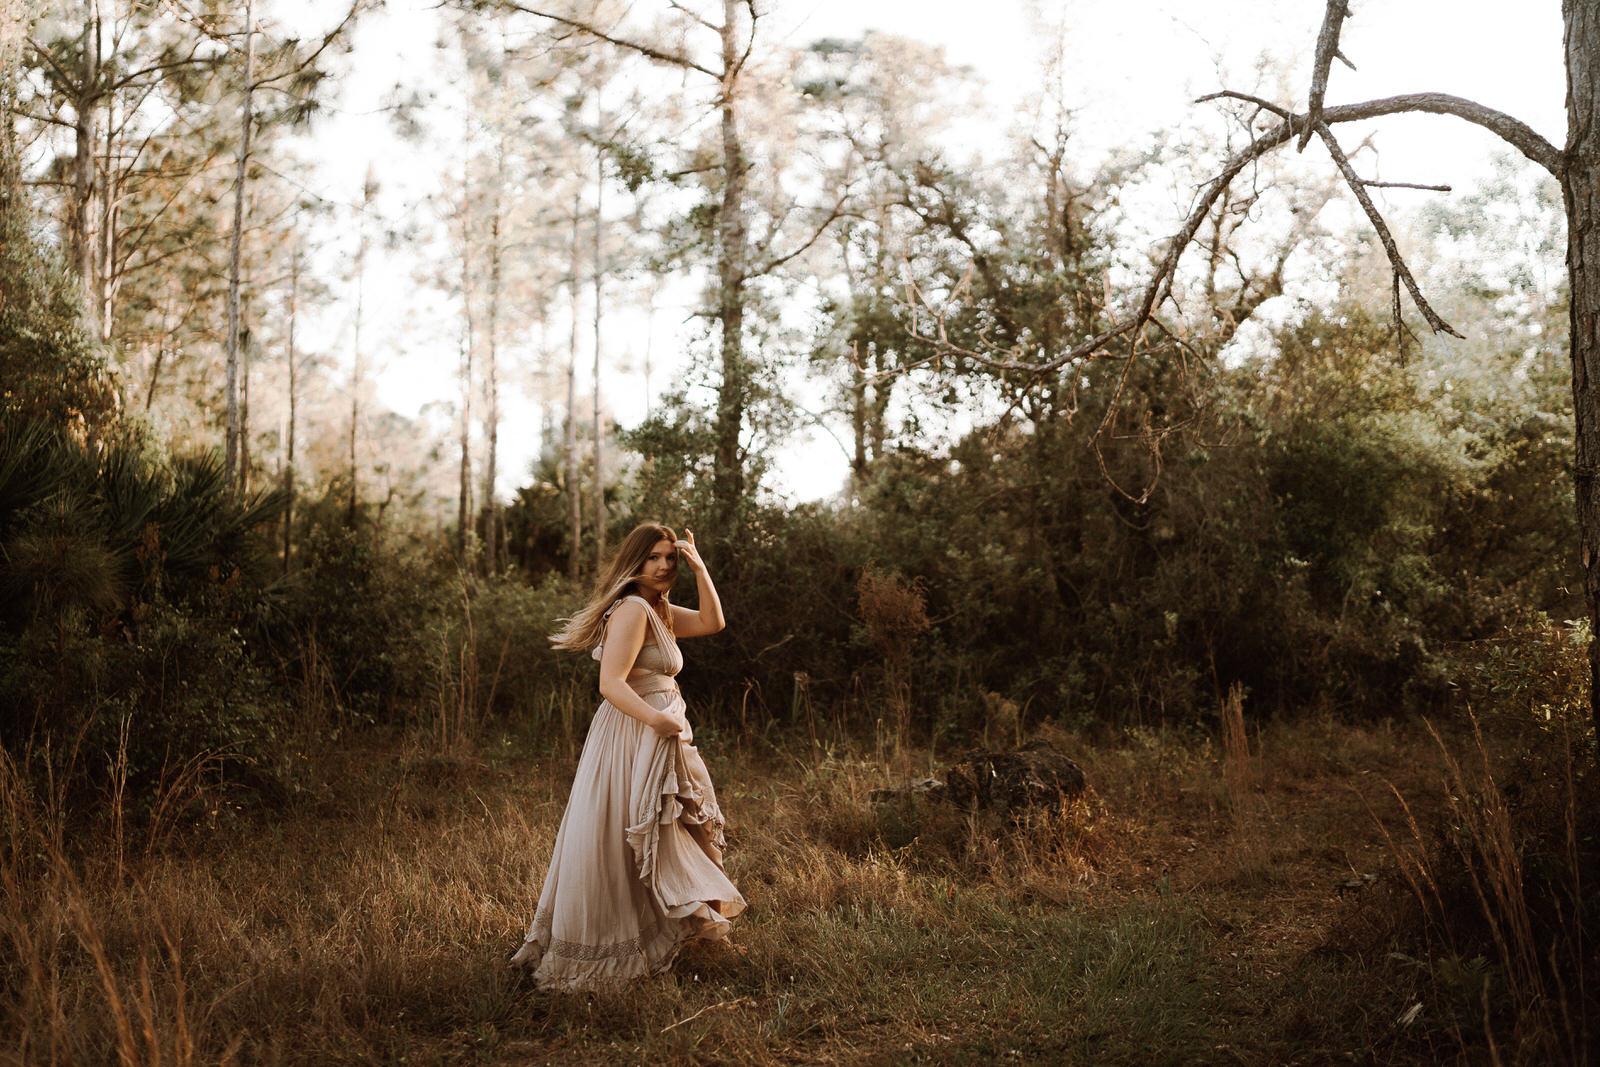 Fort Myers Senior Photos- Michelle Gonzalez Photography- Kristen Harder-106.JPG